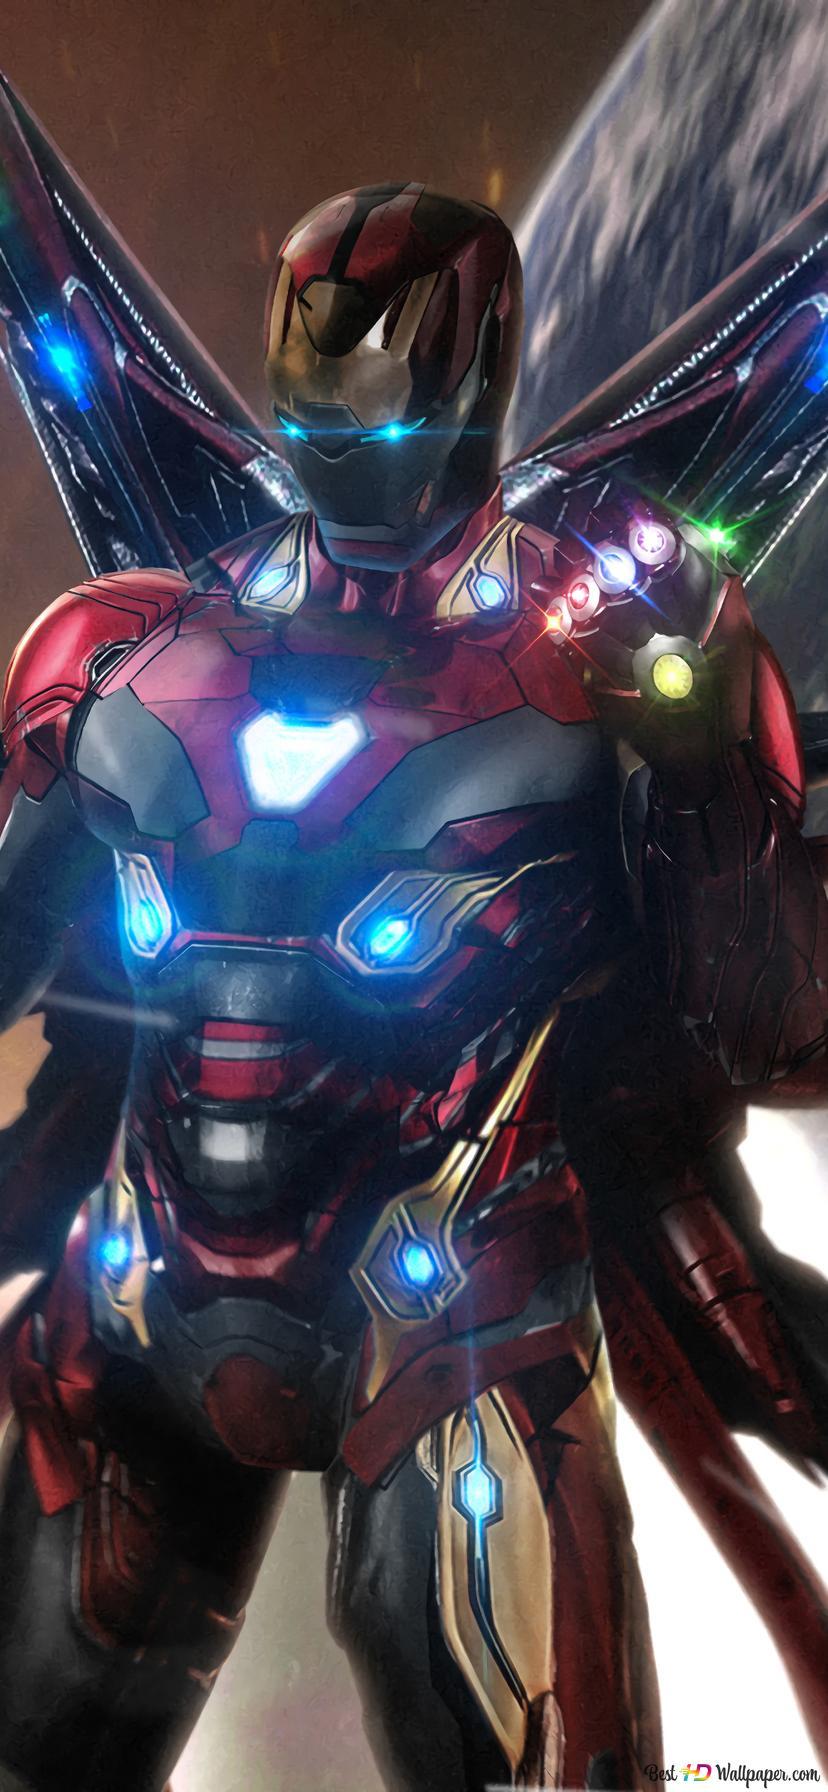 Avengers: Endgame - Iron Man Infinity